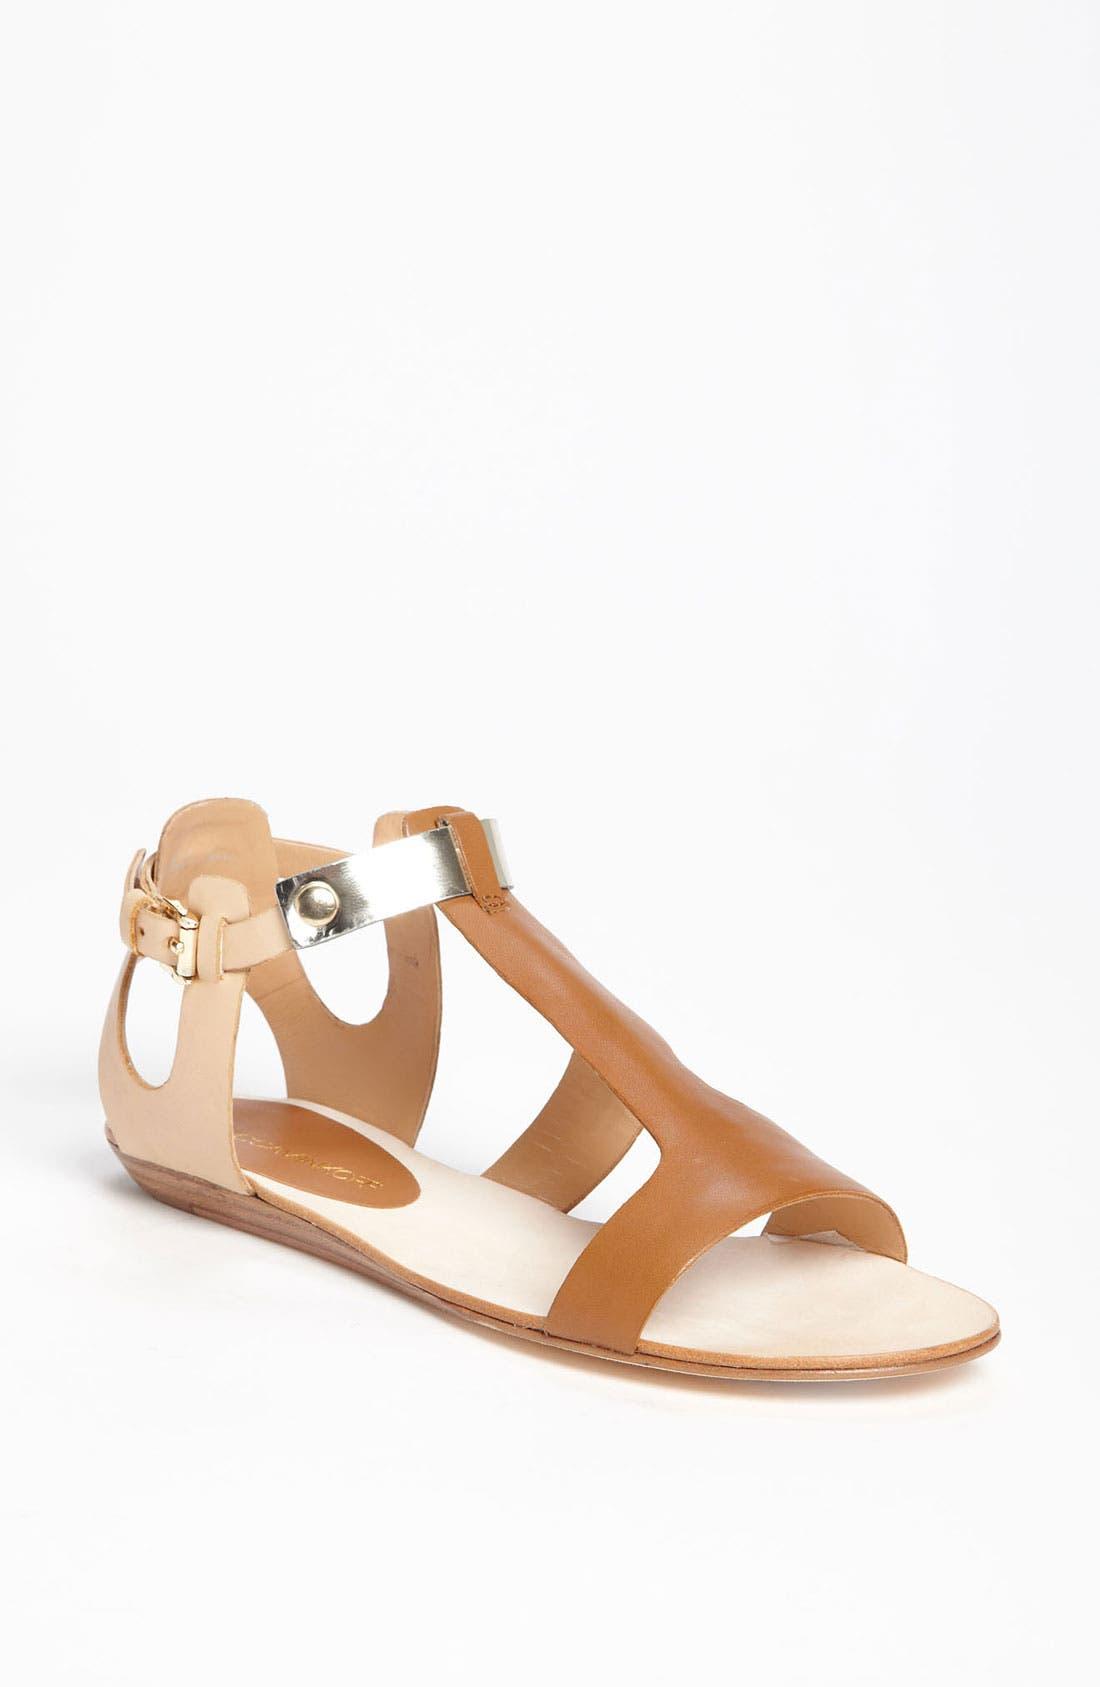 Alternate Image 1 Selected - Rebecca Minkoff 'Bardot' Sandal